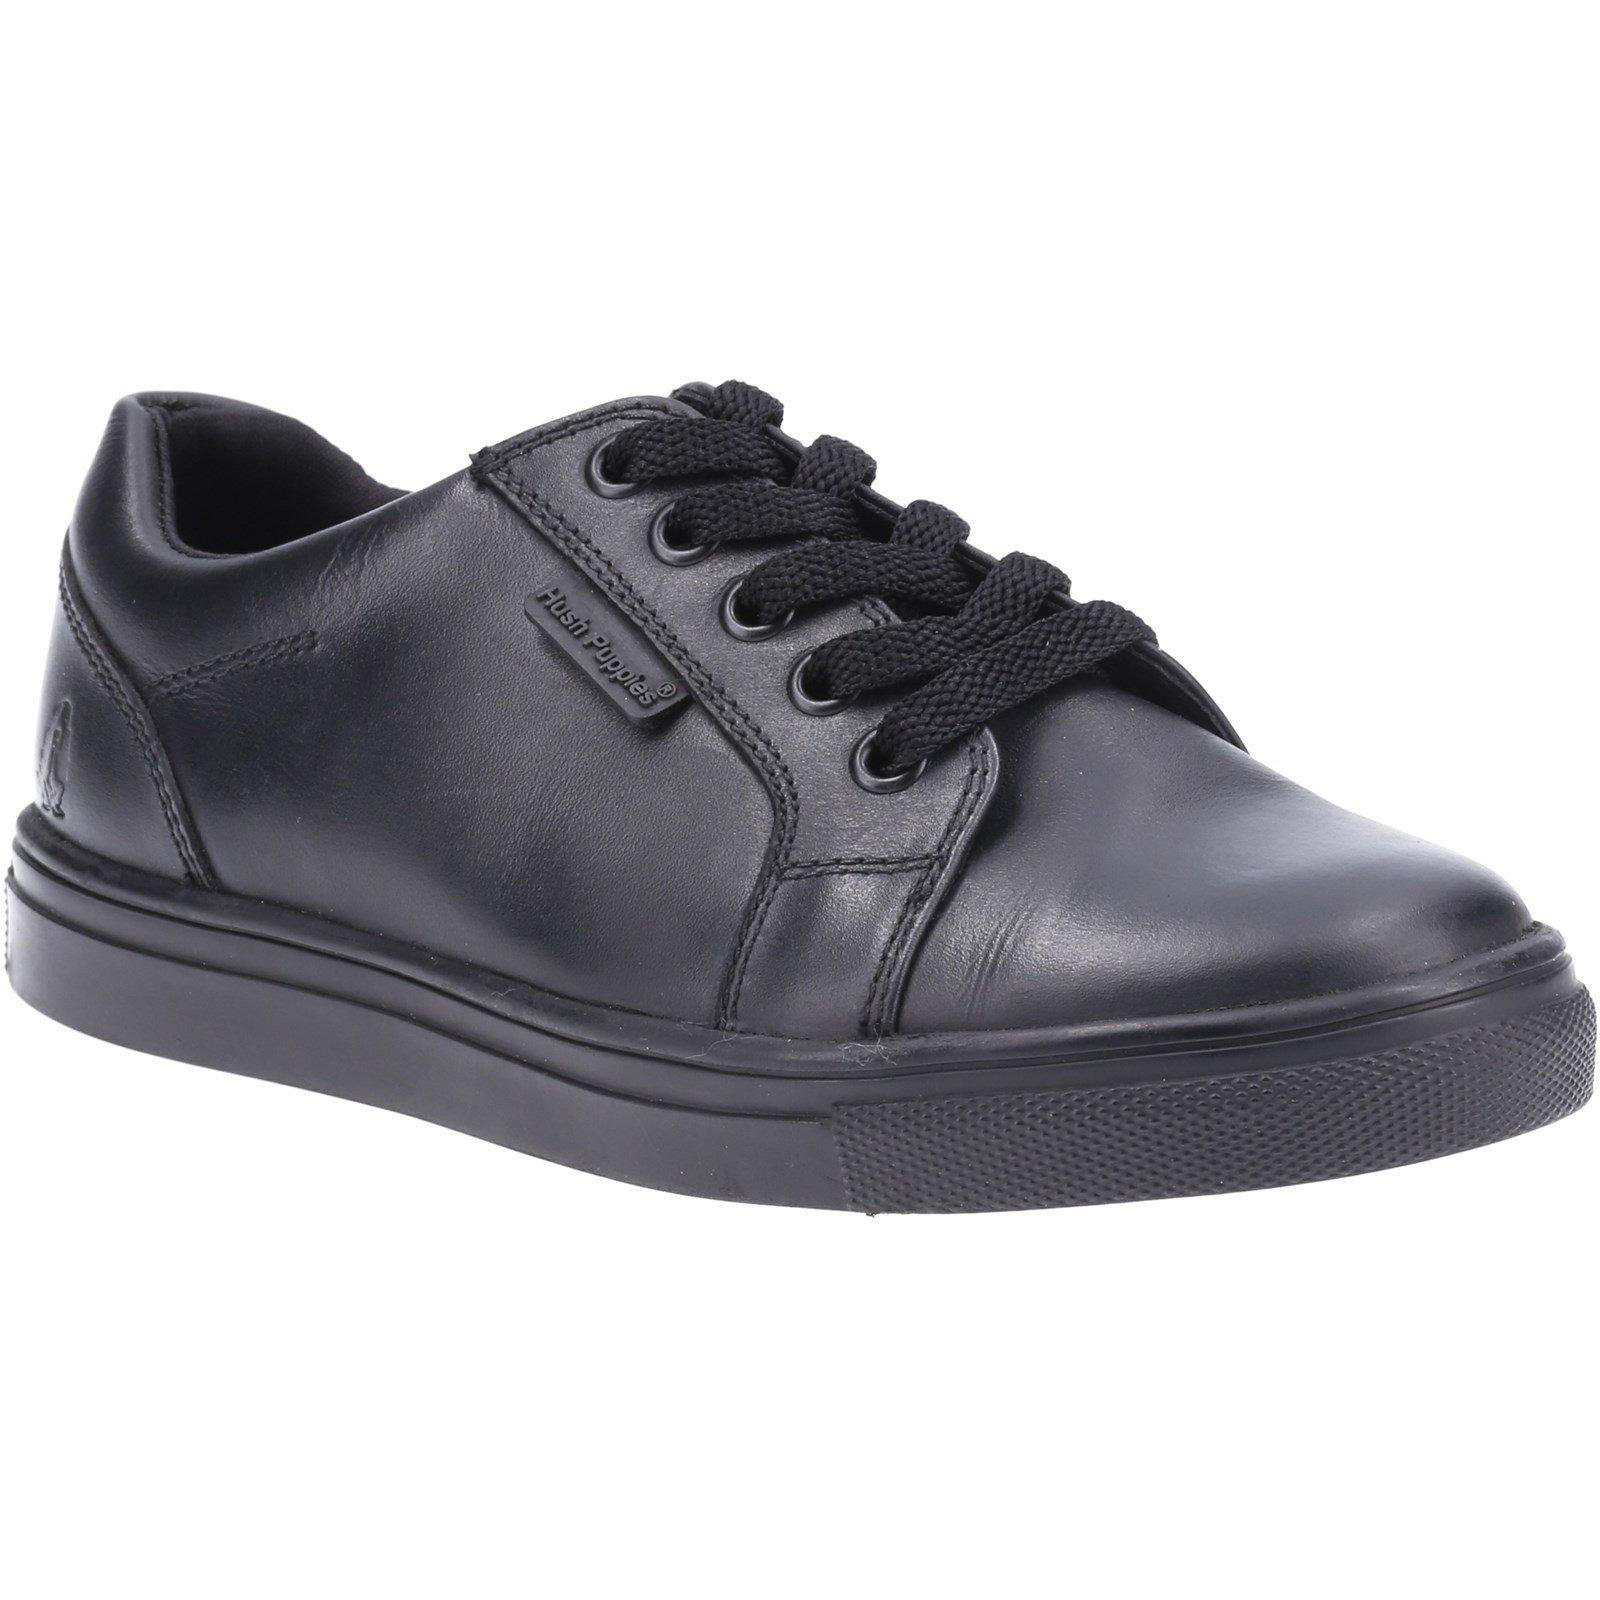 Hush Puppies Kid's Sam Junior School Shoe Black 32579 - Black 12